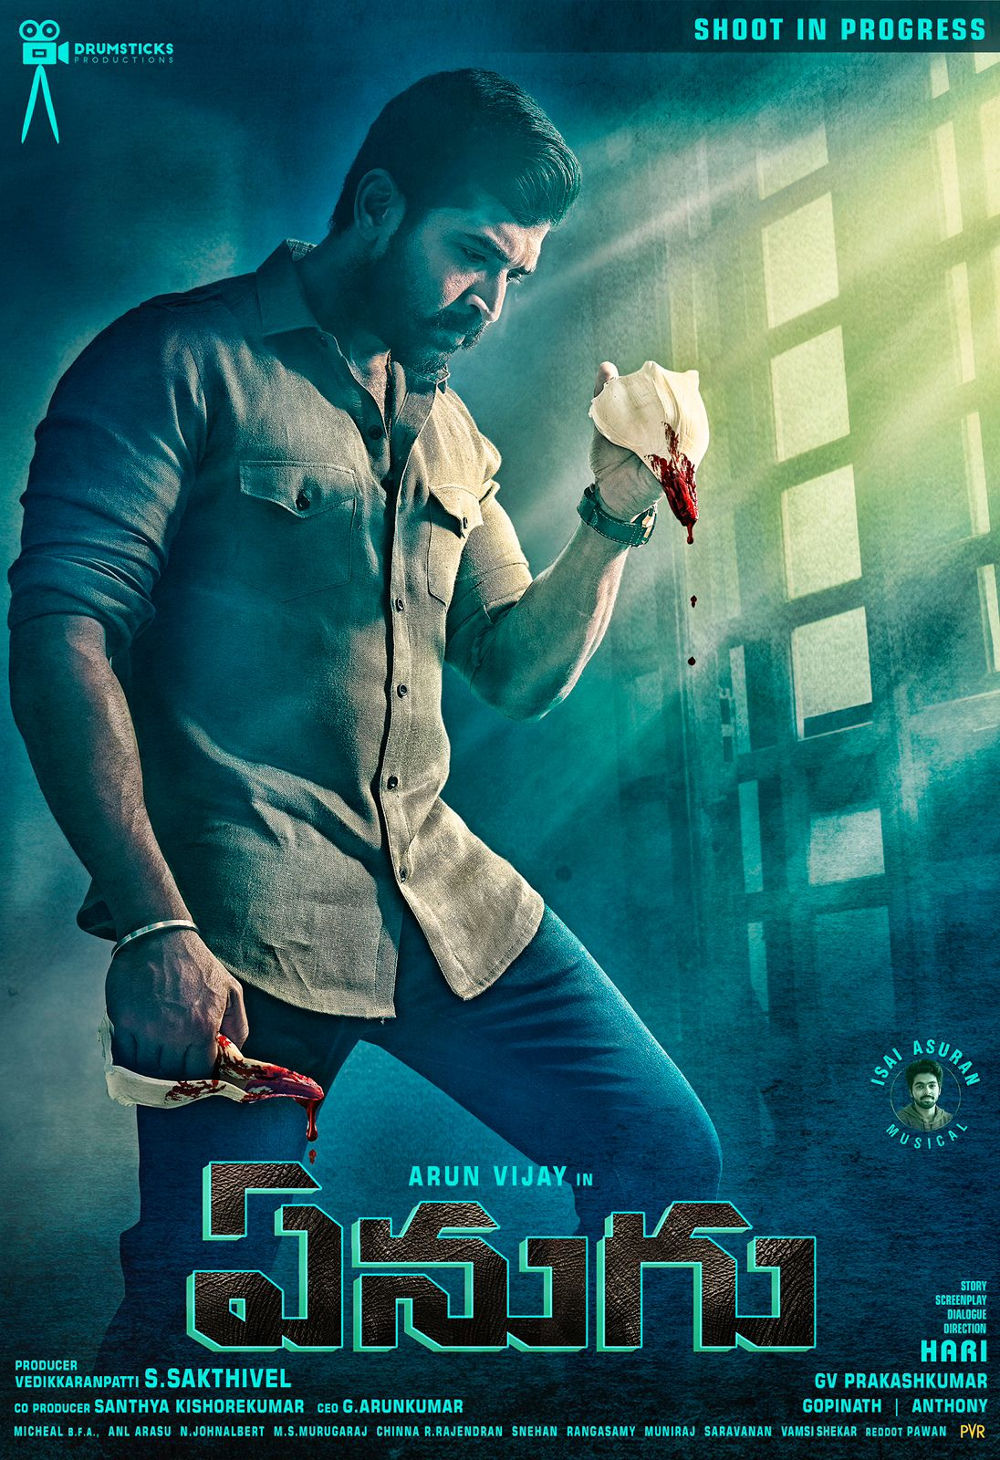 Arun Vijay Enugu Movie First Look HD Poster